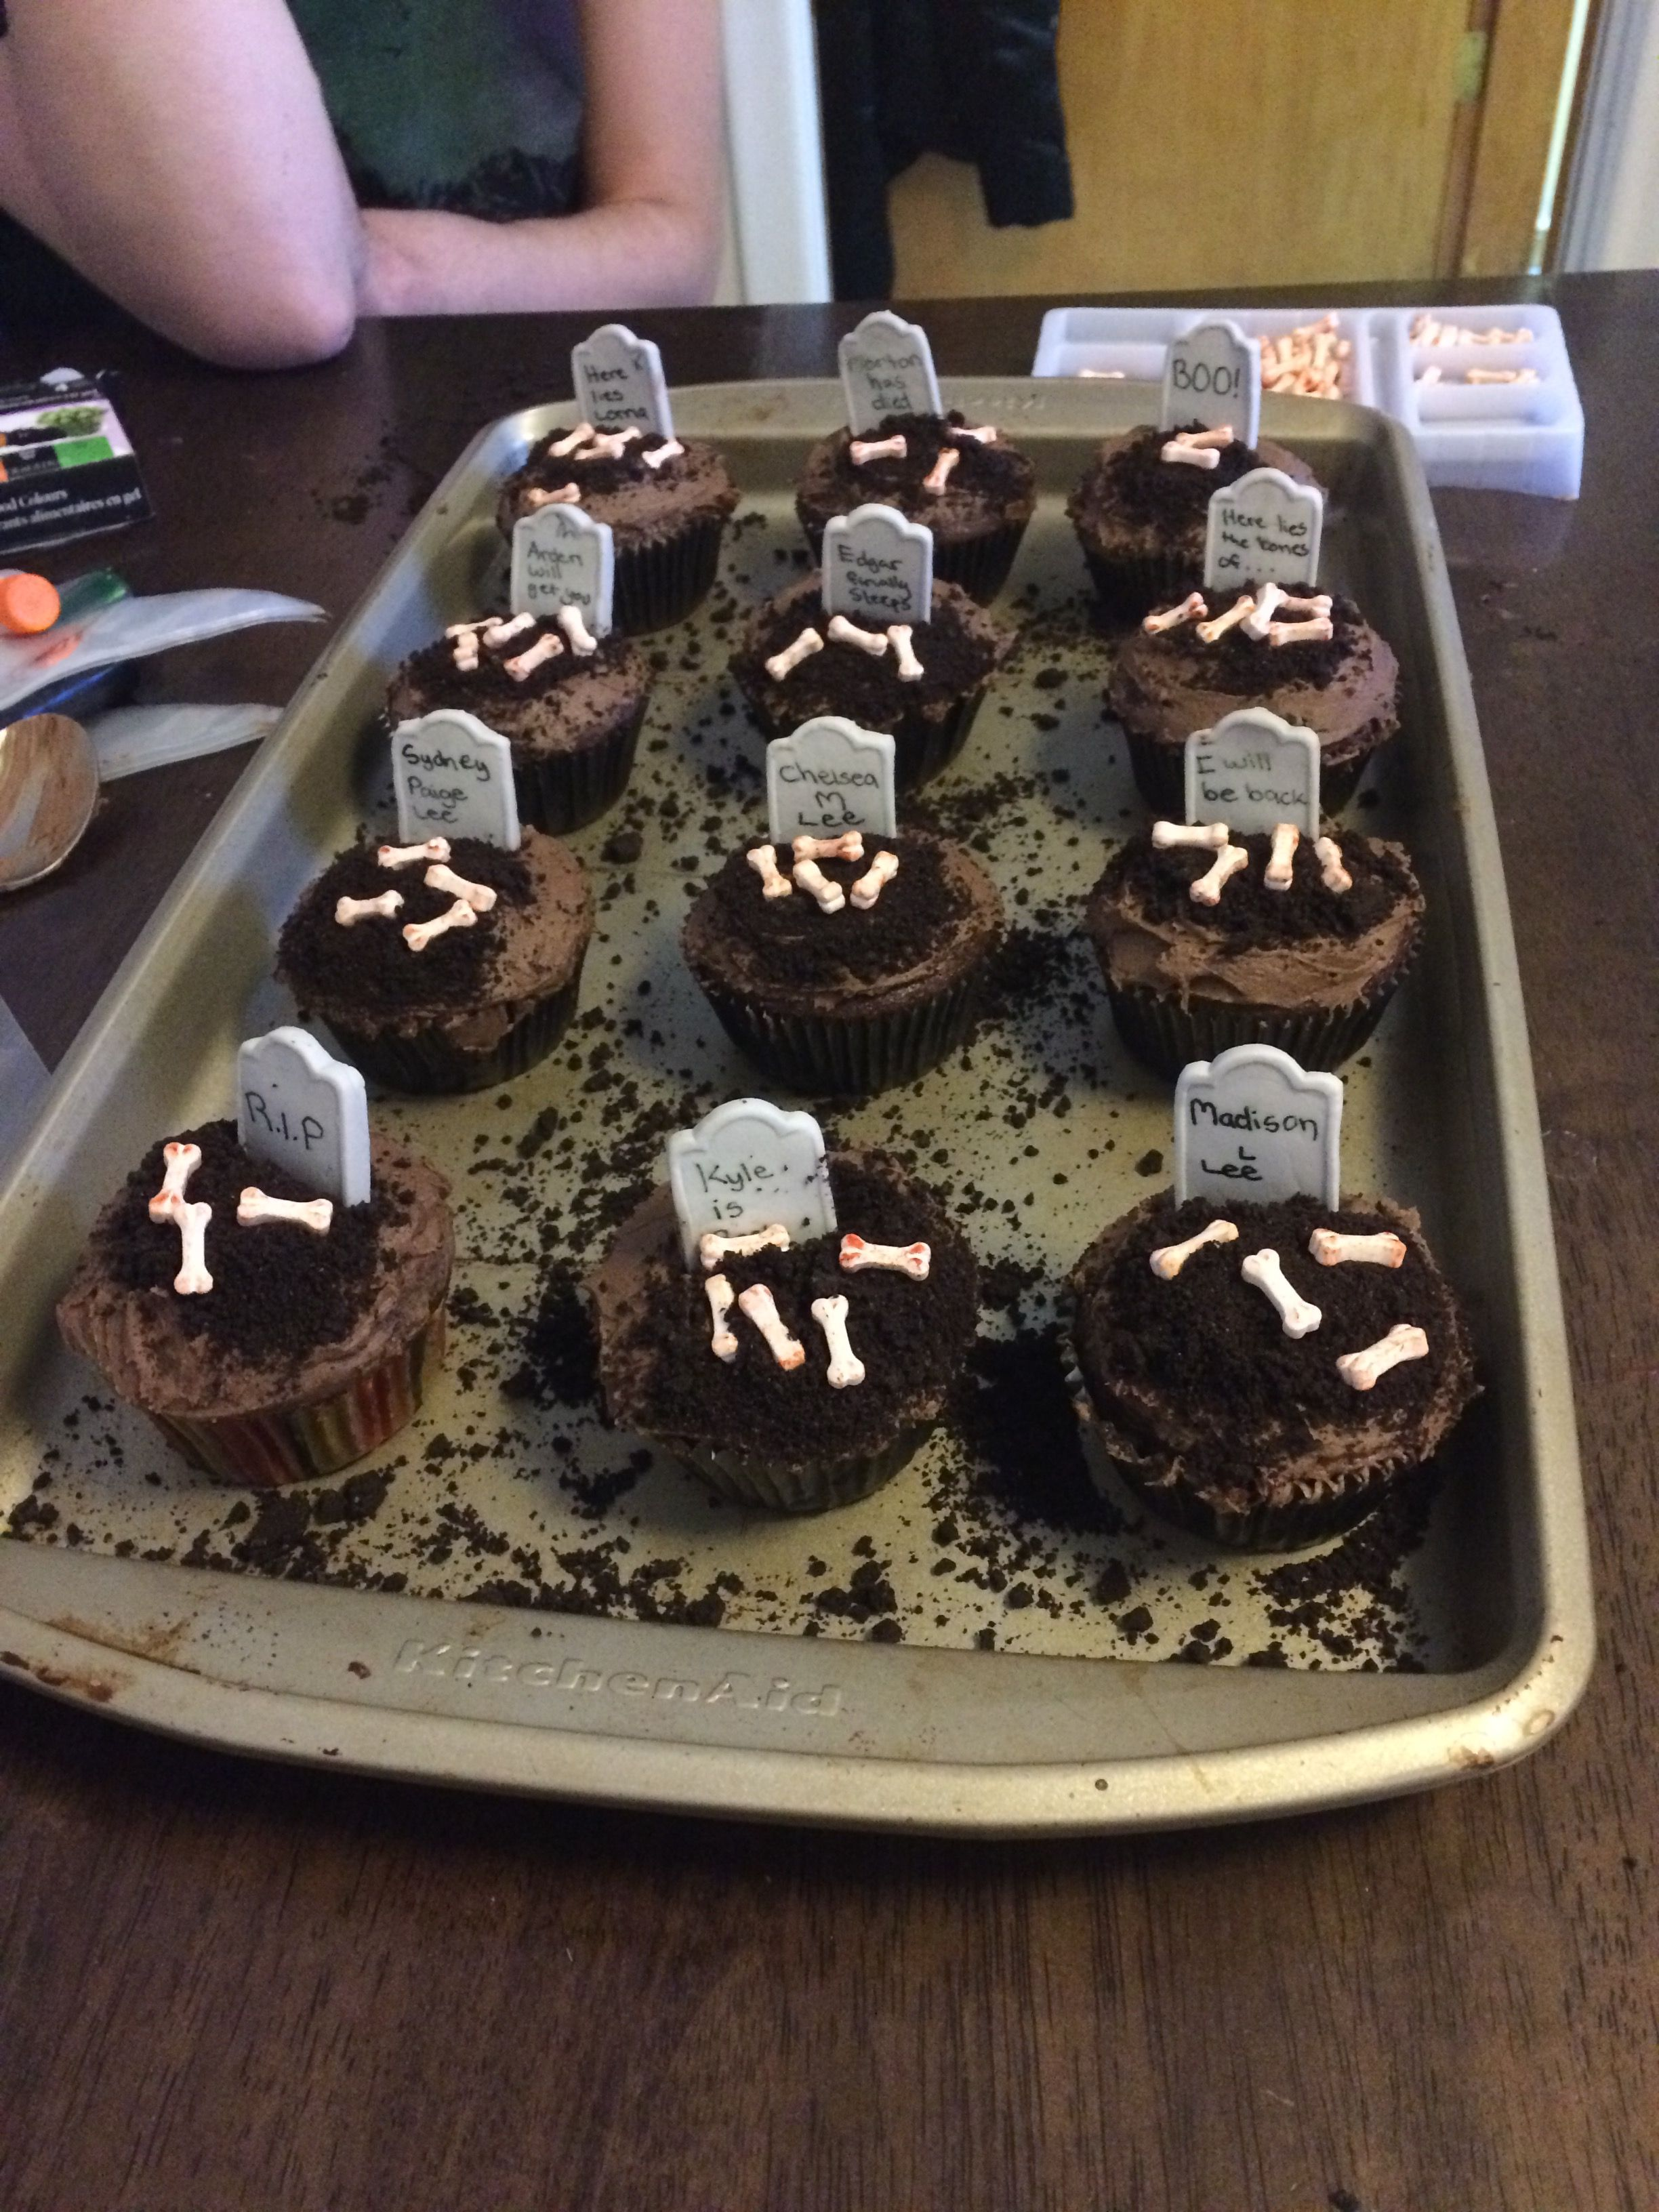 Grave cupcakes